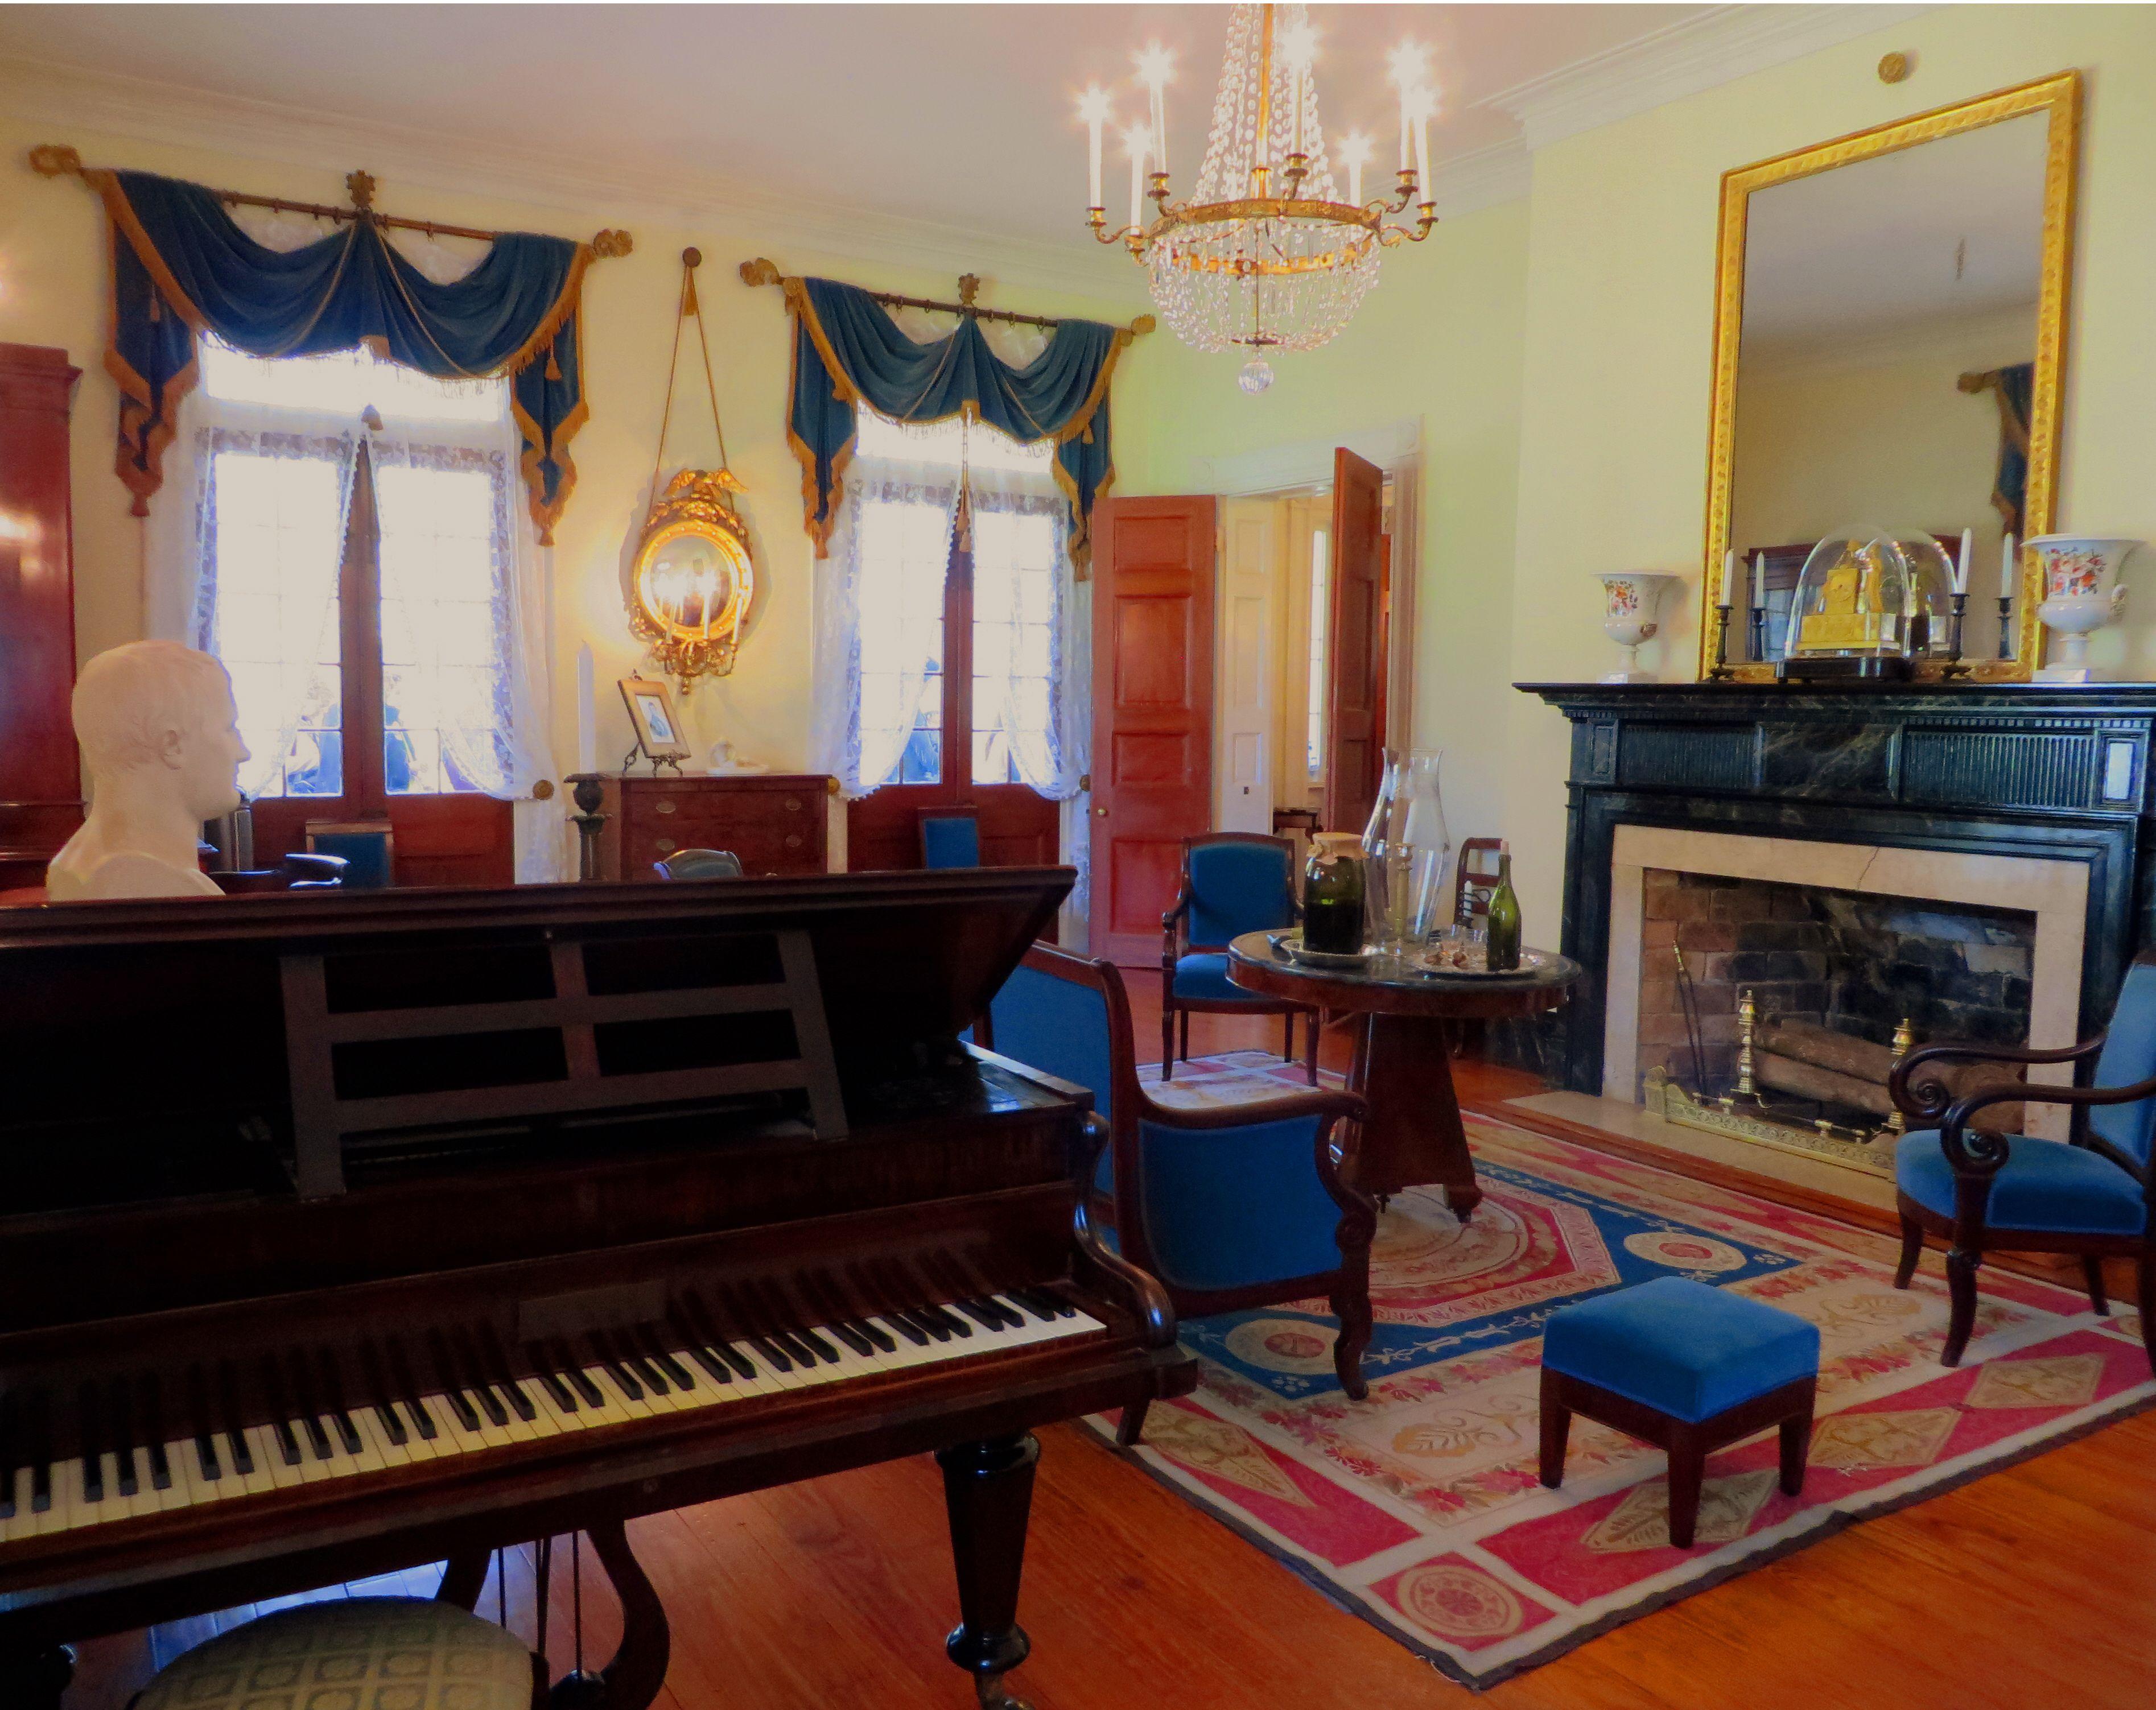 106 ABC_OA_piano parlor_edit_AMYRET.jpg